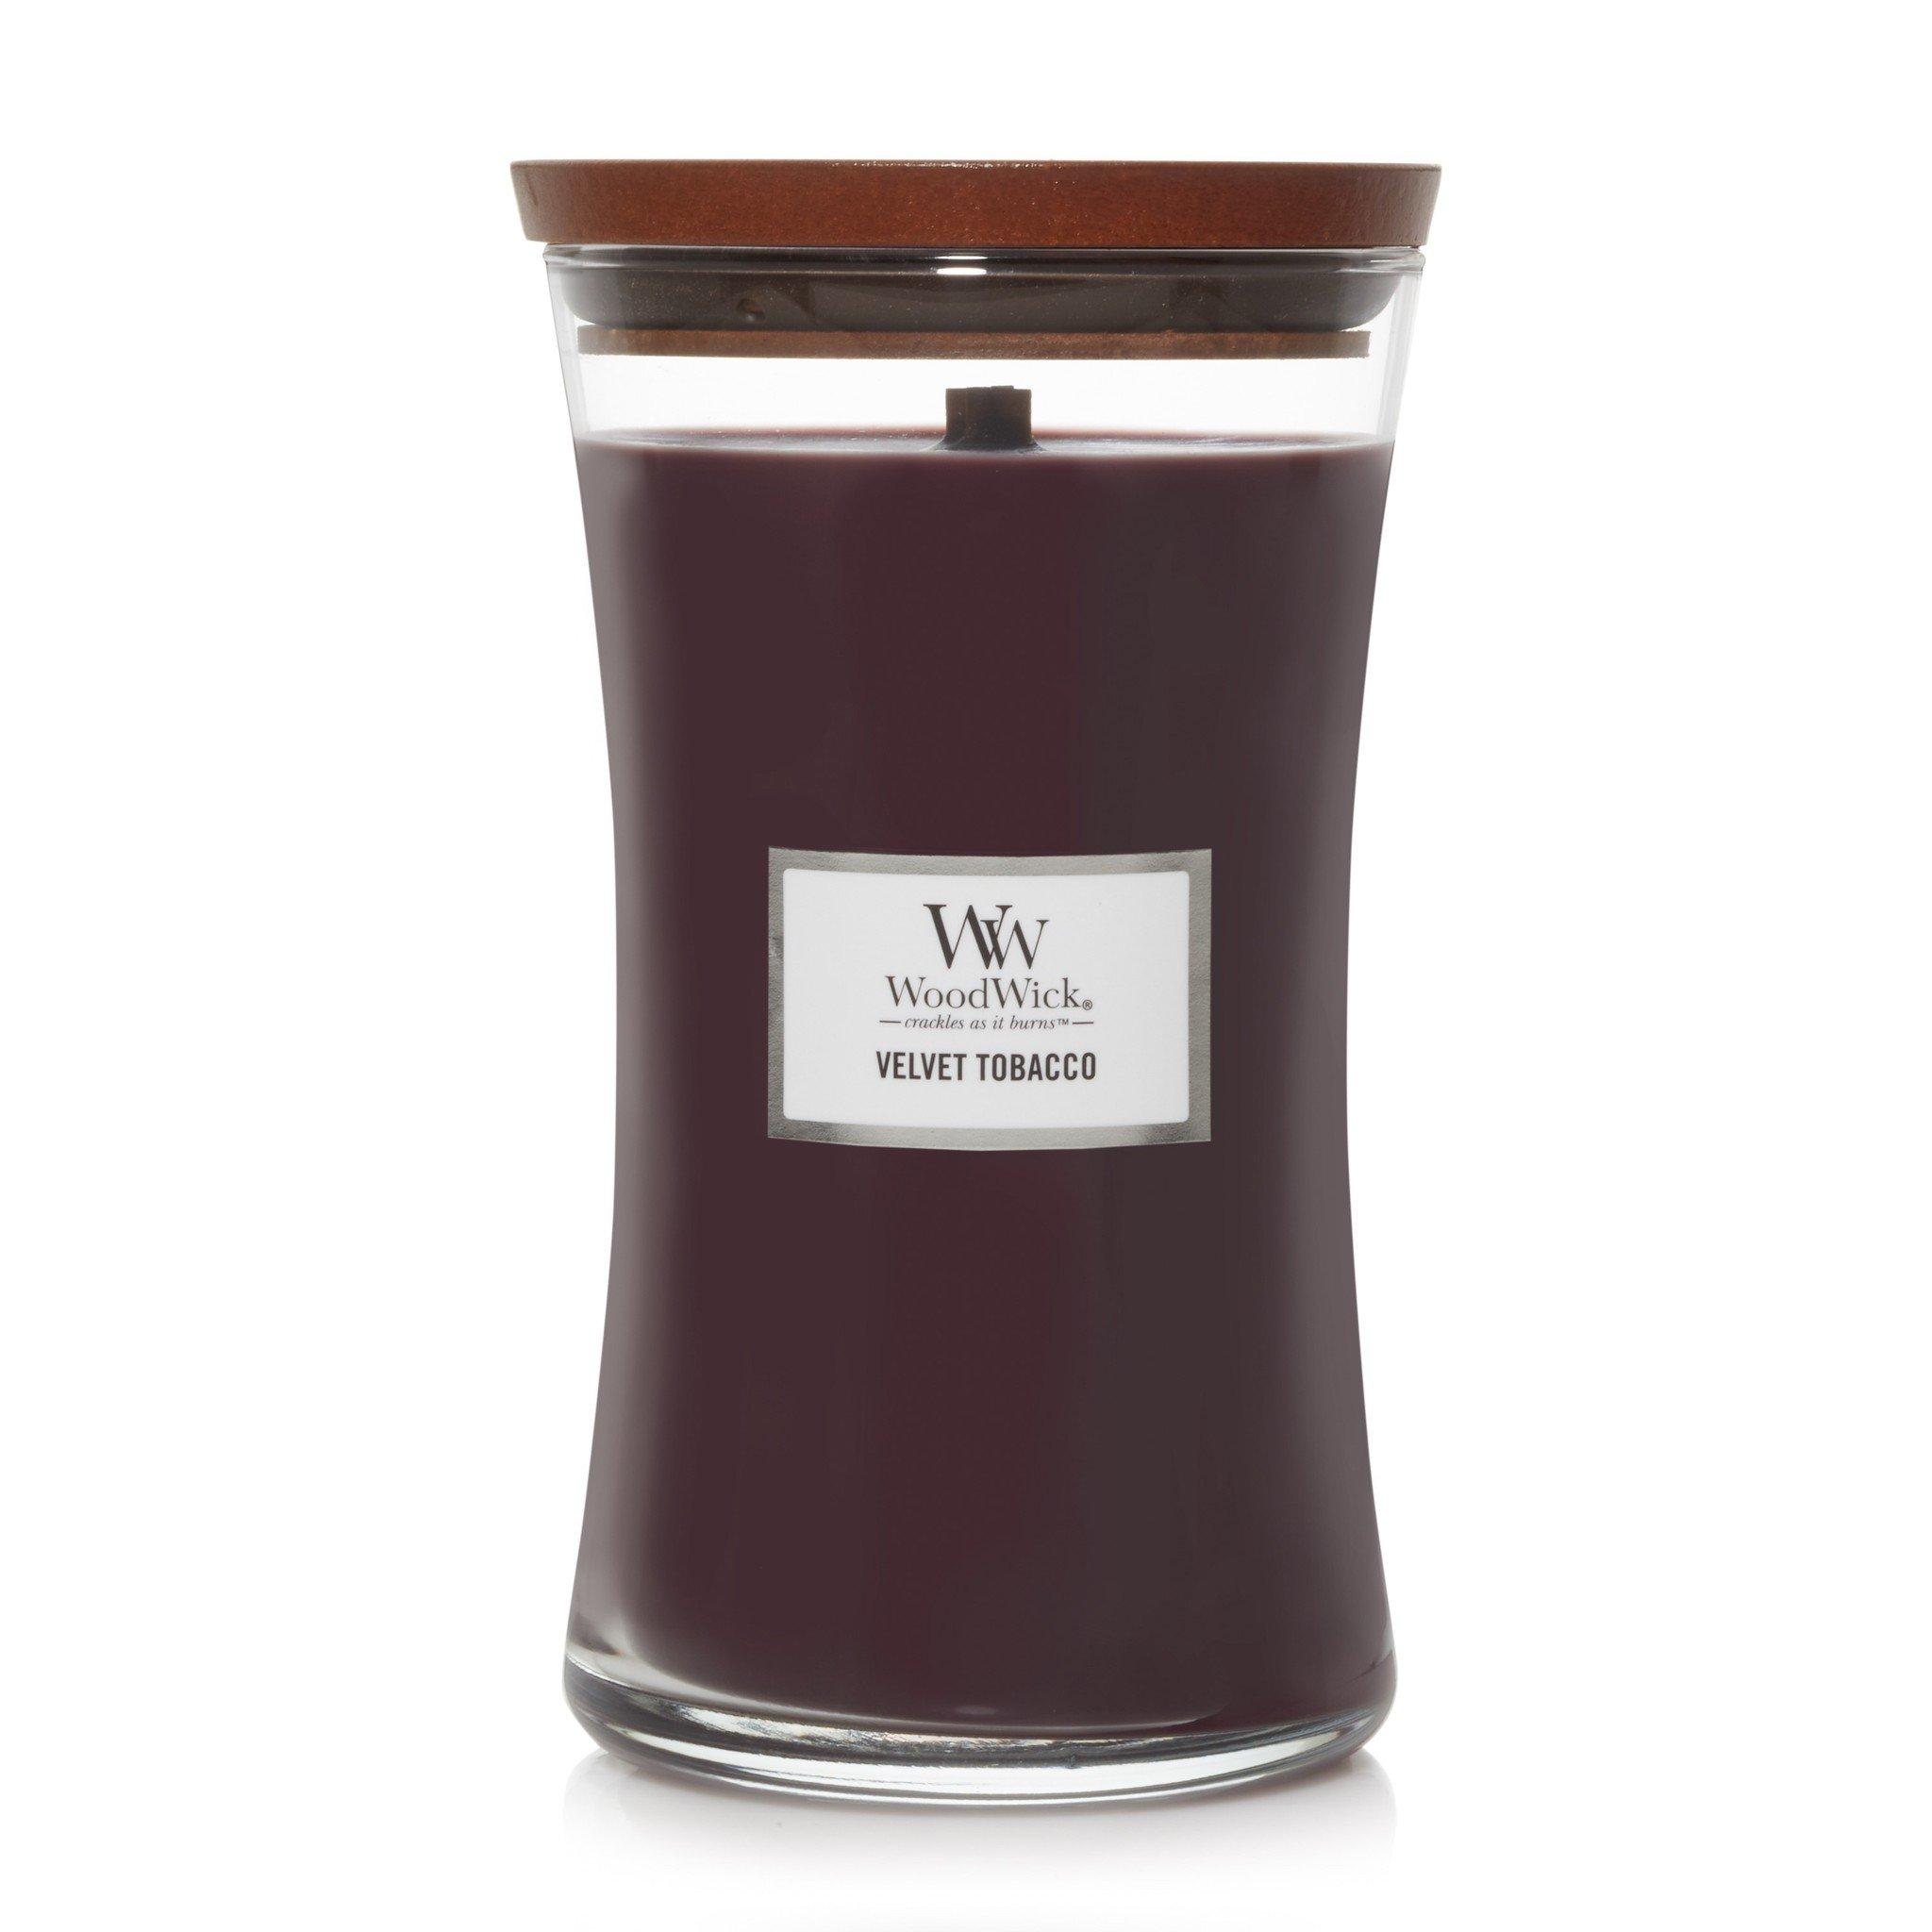 WOODWICK bougie  velvet tobacco large-1